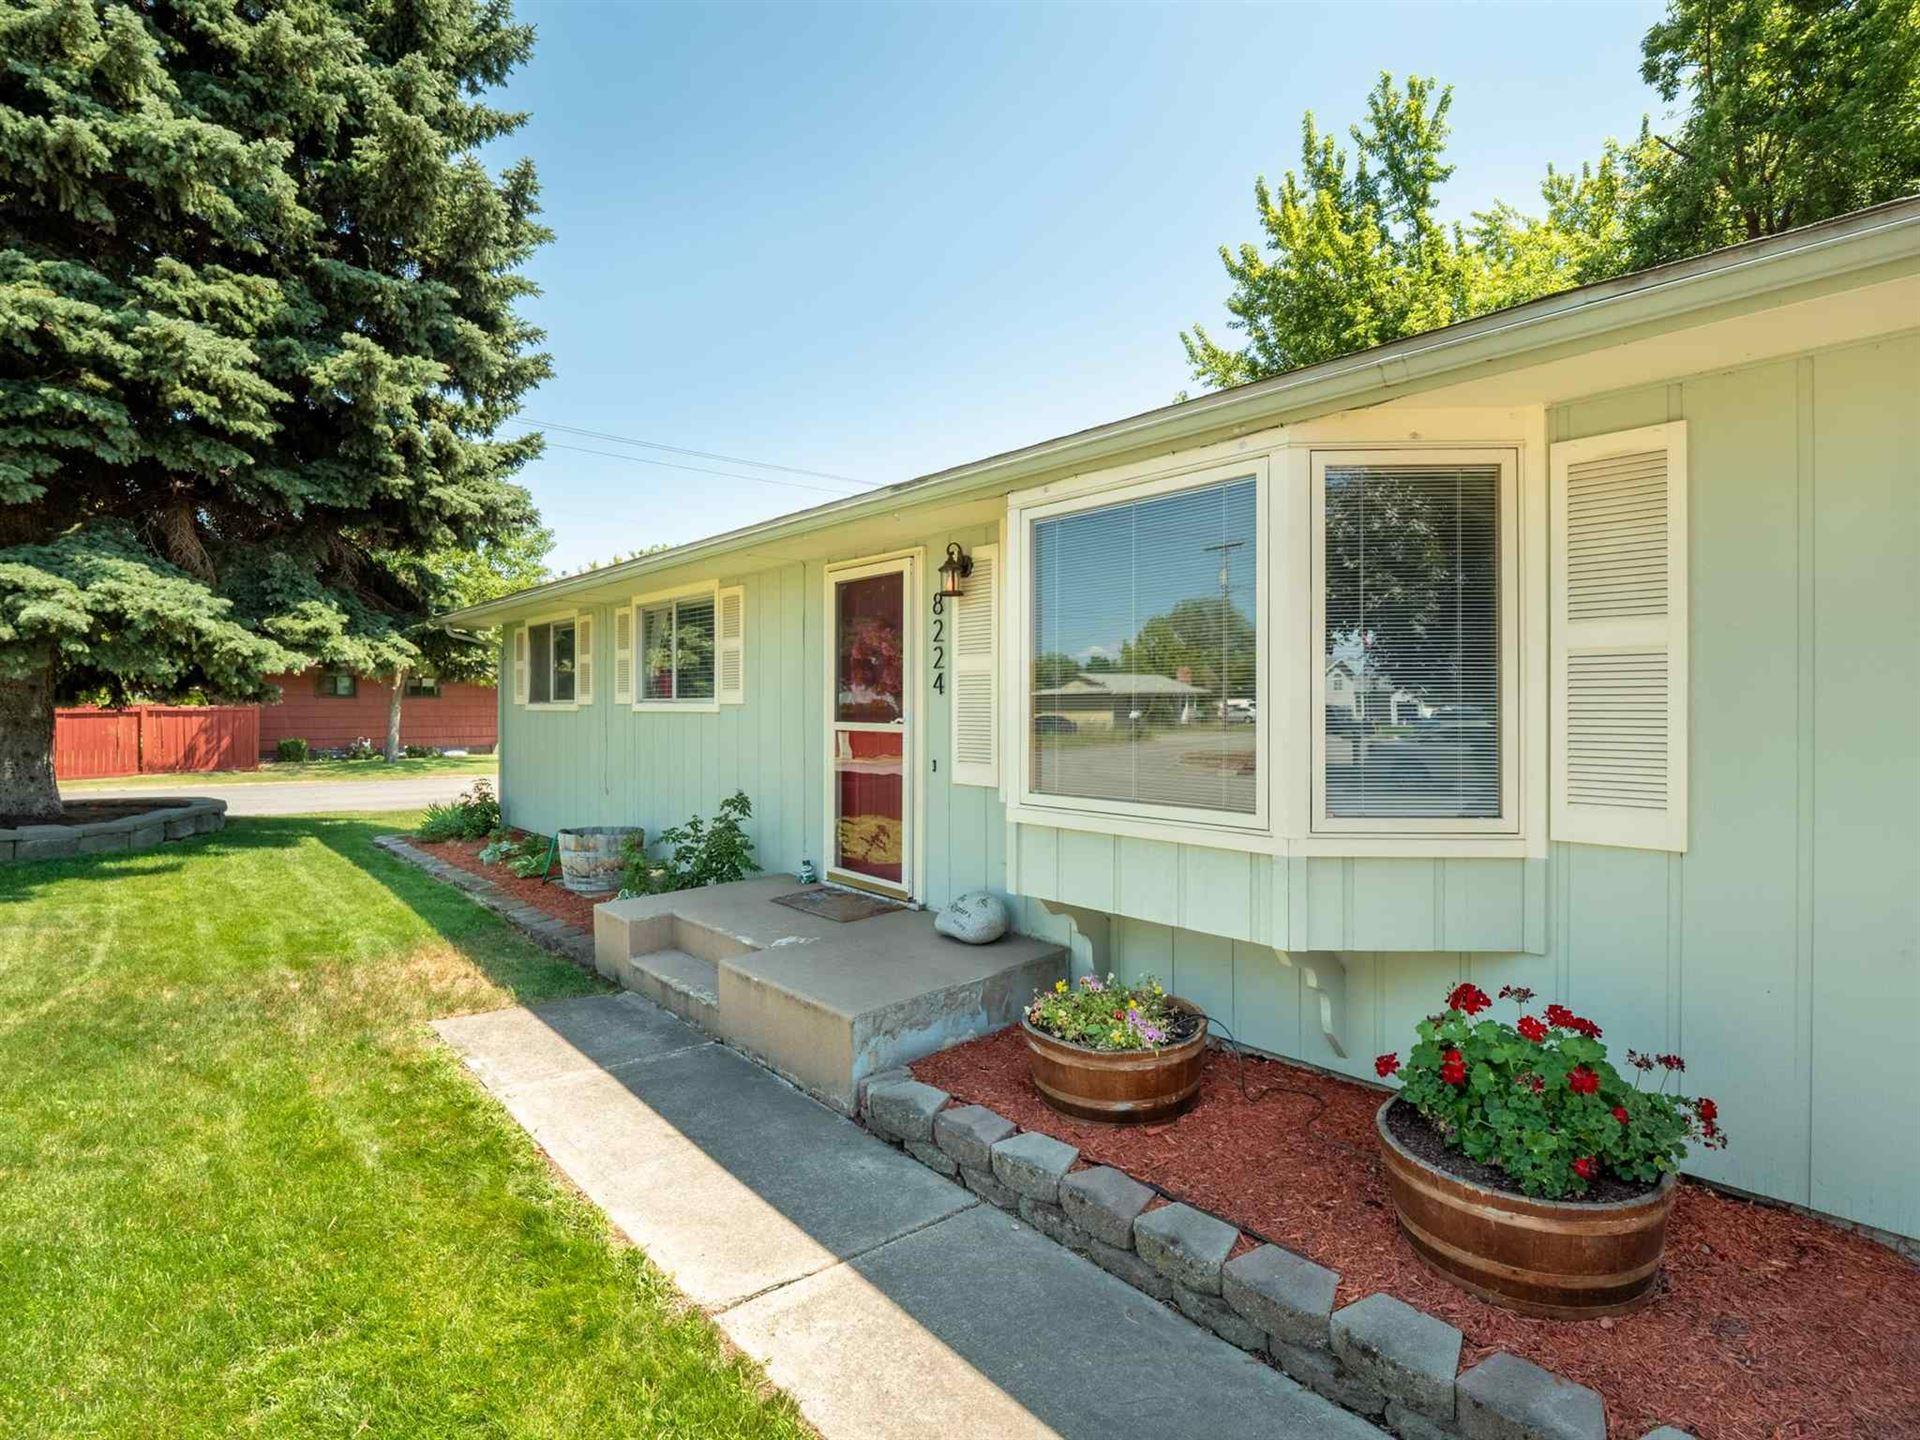 8224 E Baldwin Ave, Spokane, WA 99212 - #: 202118777